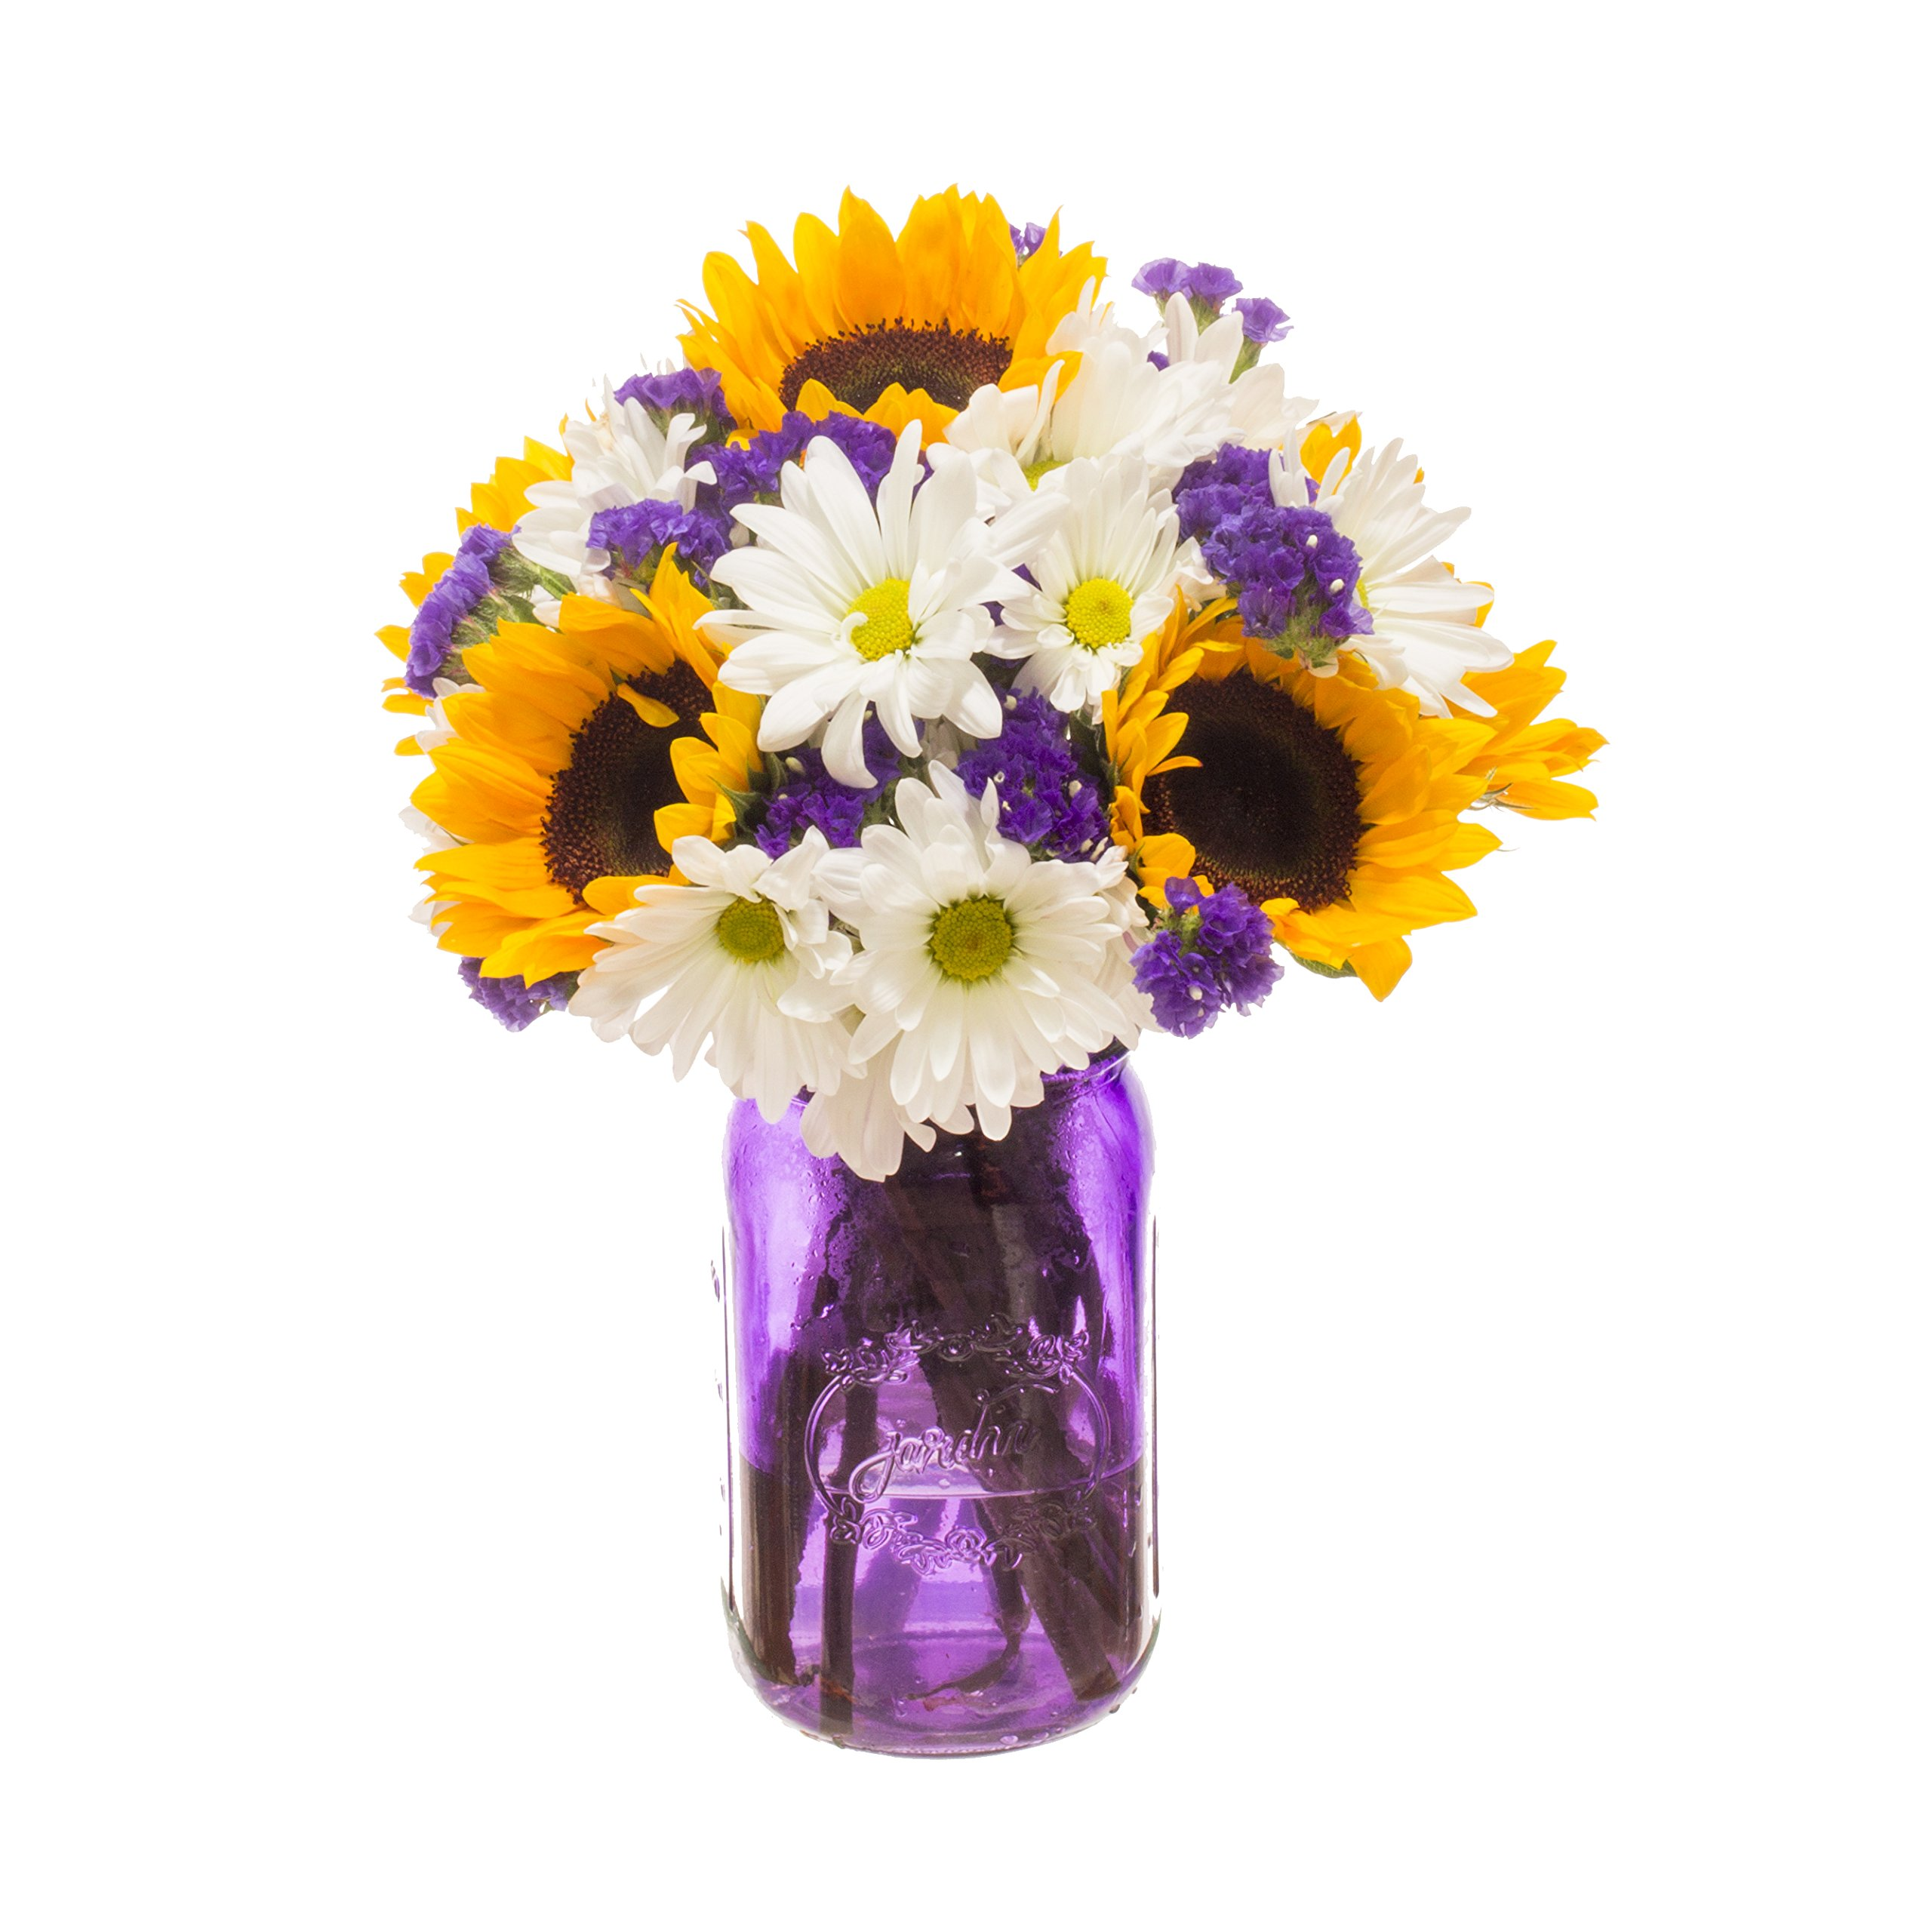 eFlowy Greatfull Floral Vase Arrangement by eFlowy (Image #1)